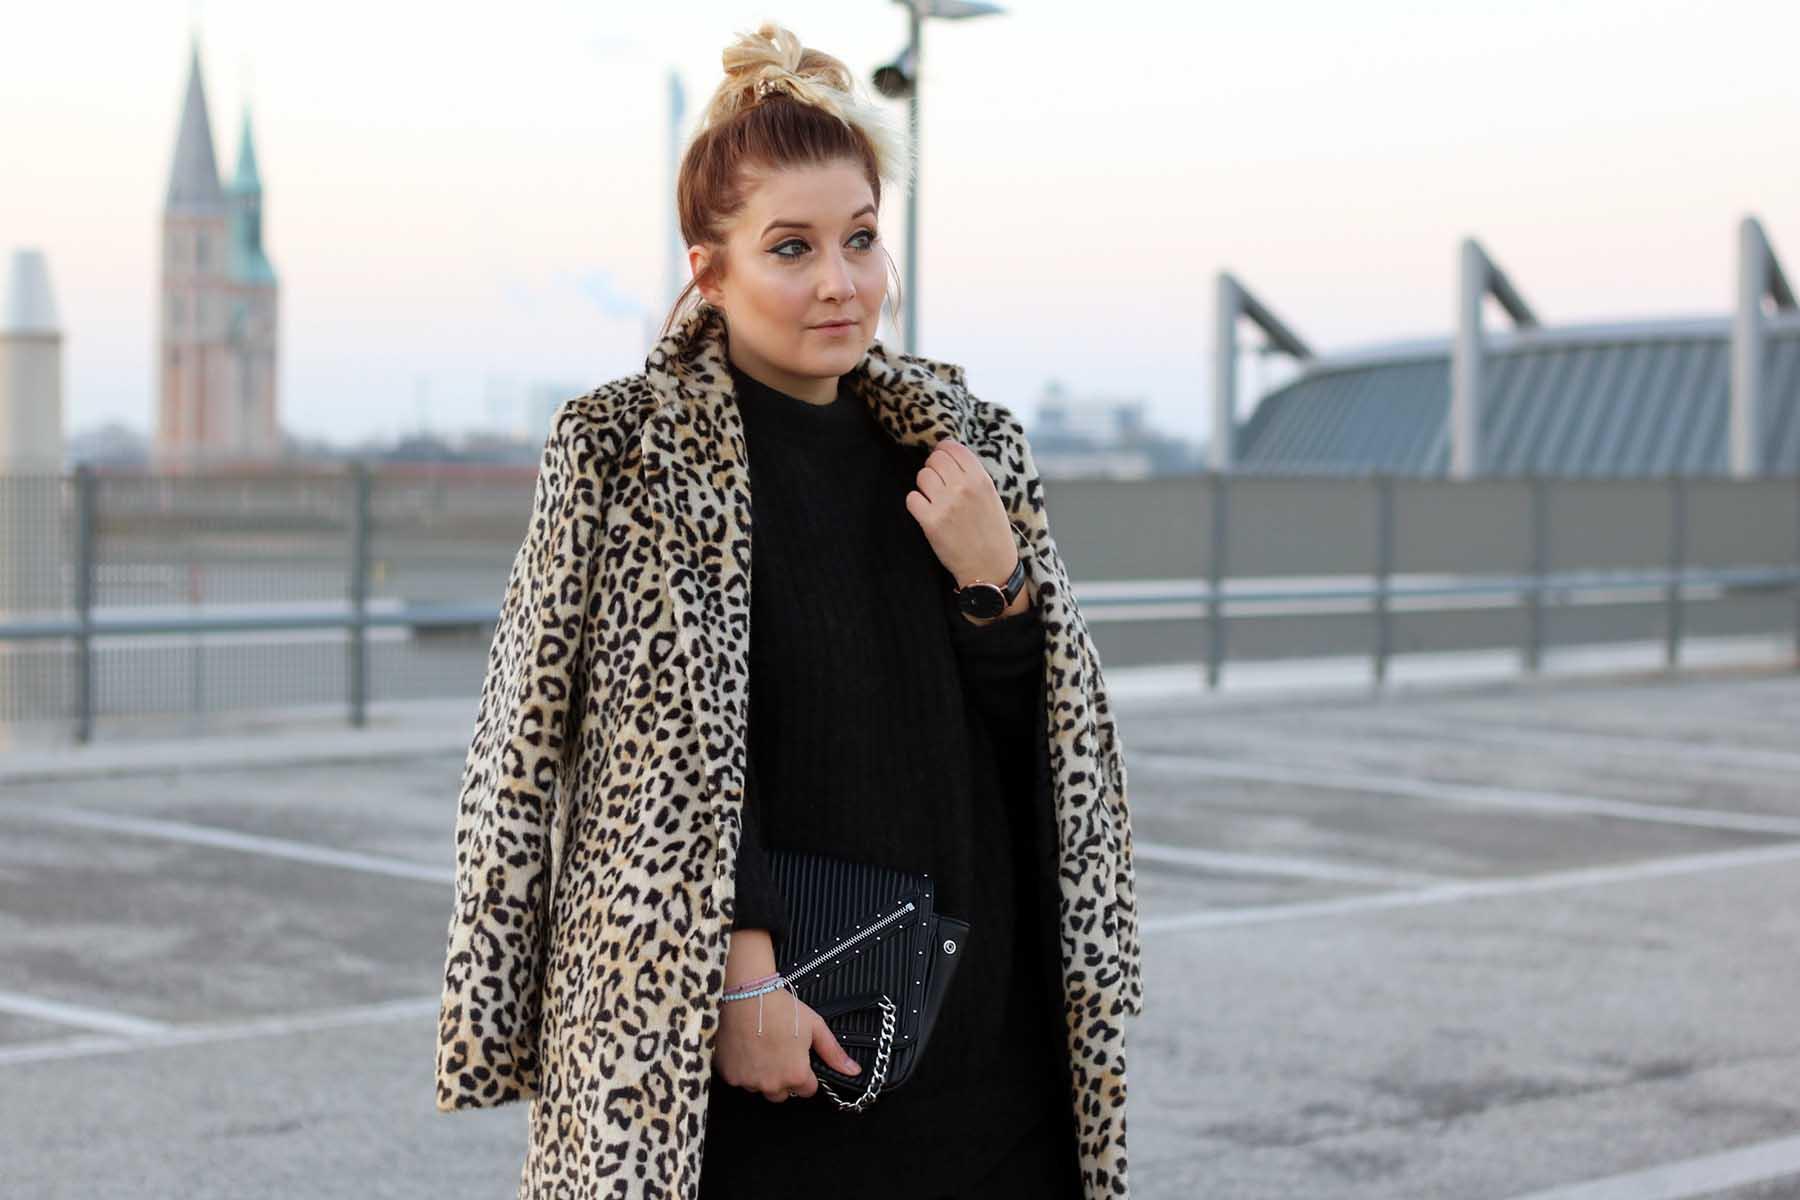 outift-leomantel-mantel-winter-leoparden-modeblog-fashionblog-look-braunschweig1